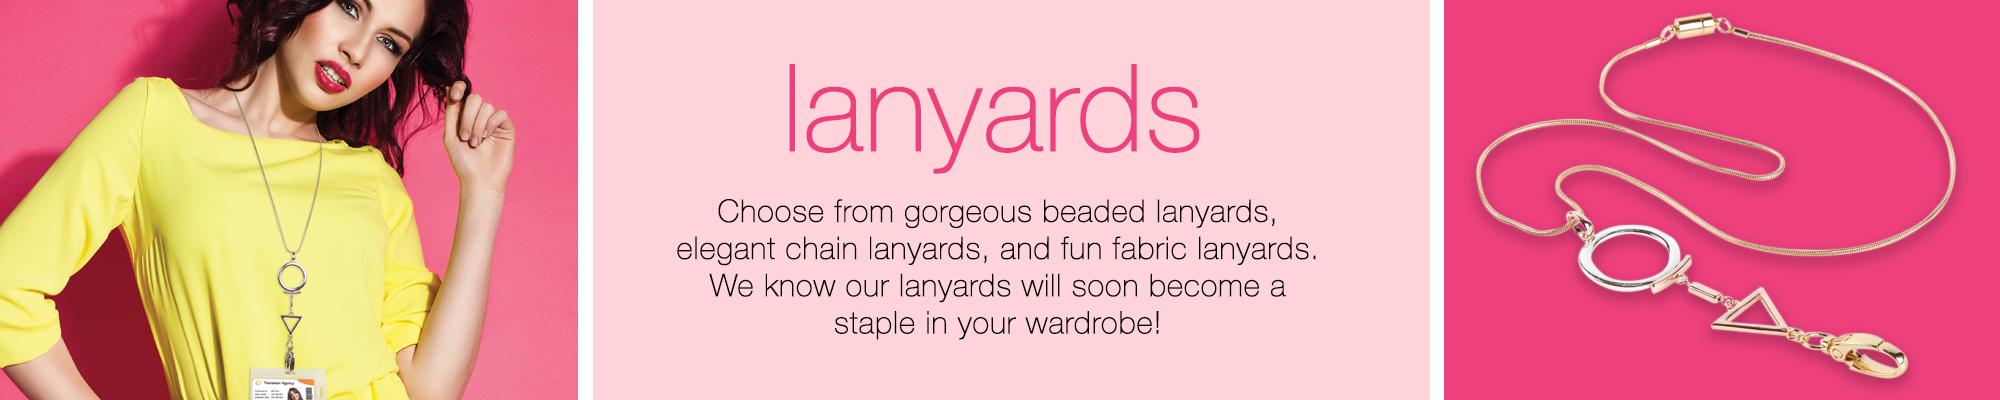 lanyard-category-header-1.jpg